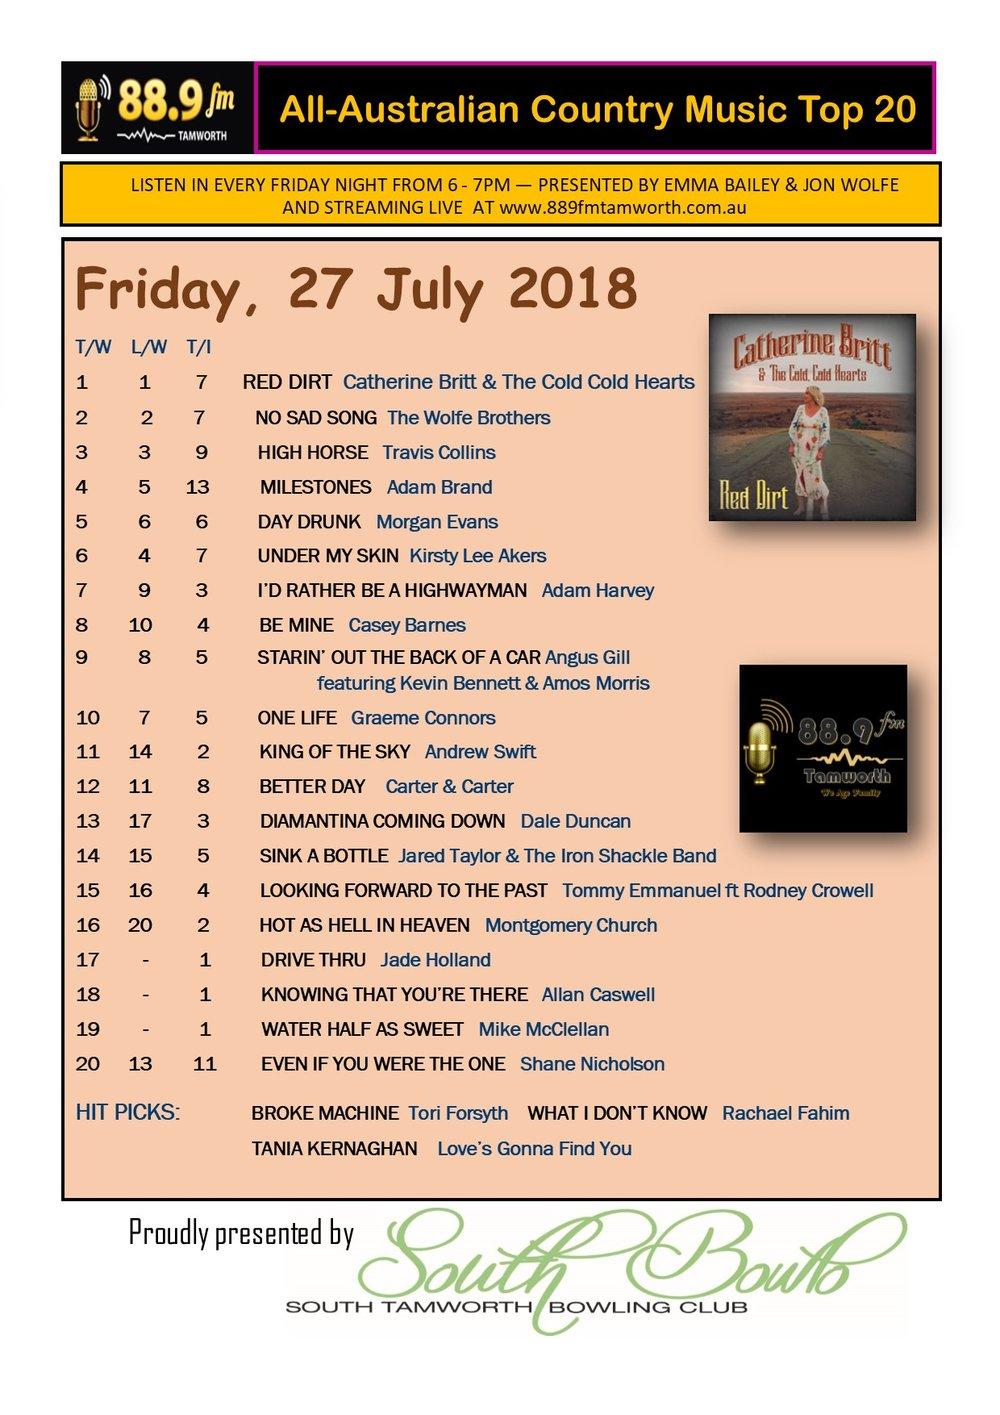 889FM CHART 27 July 2018.jpg